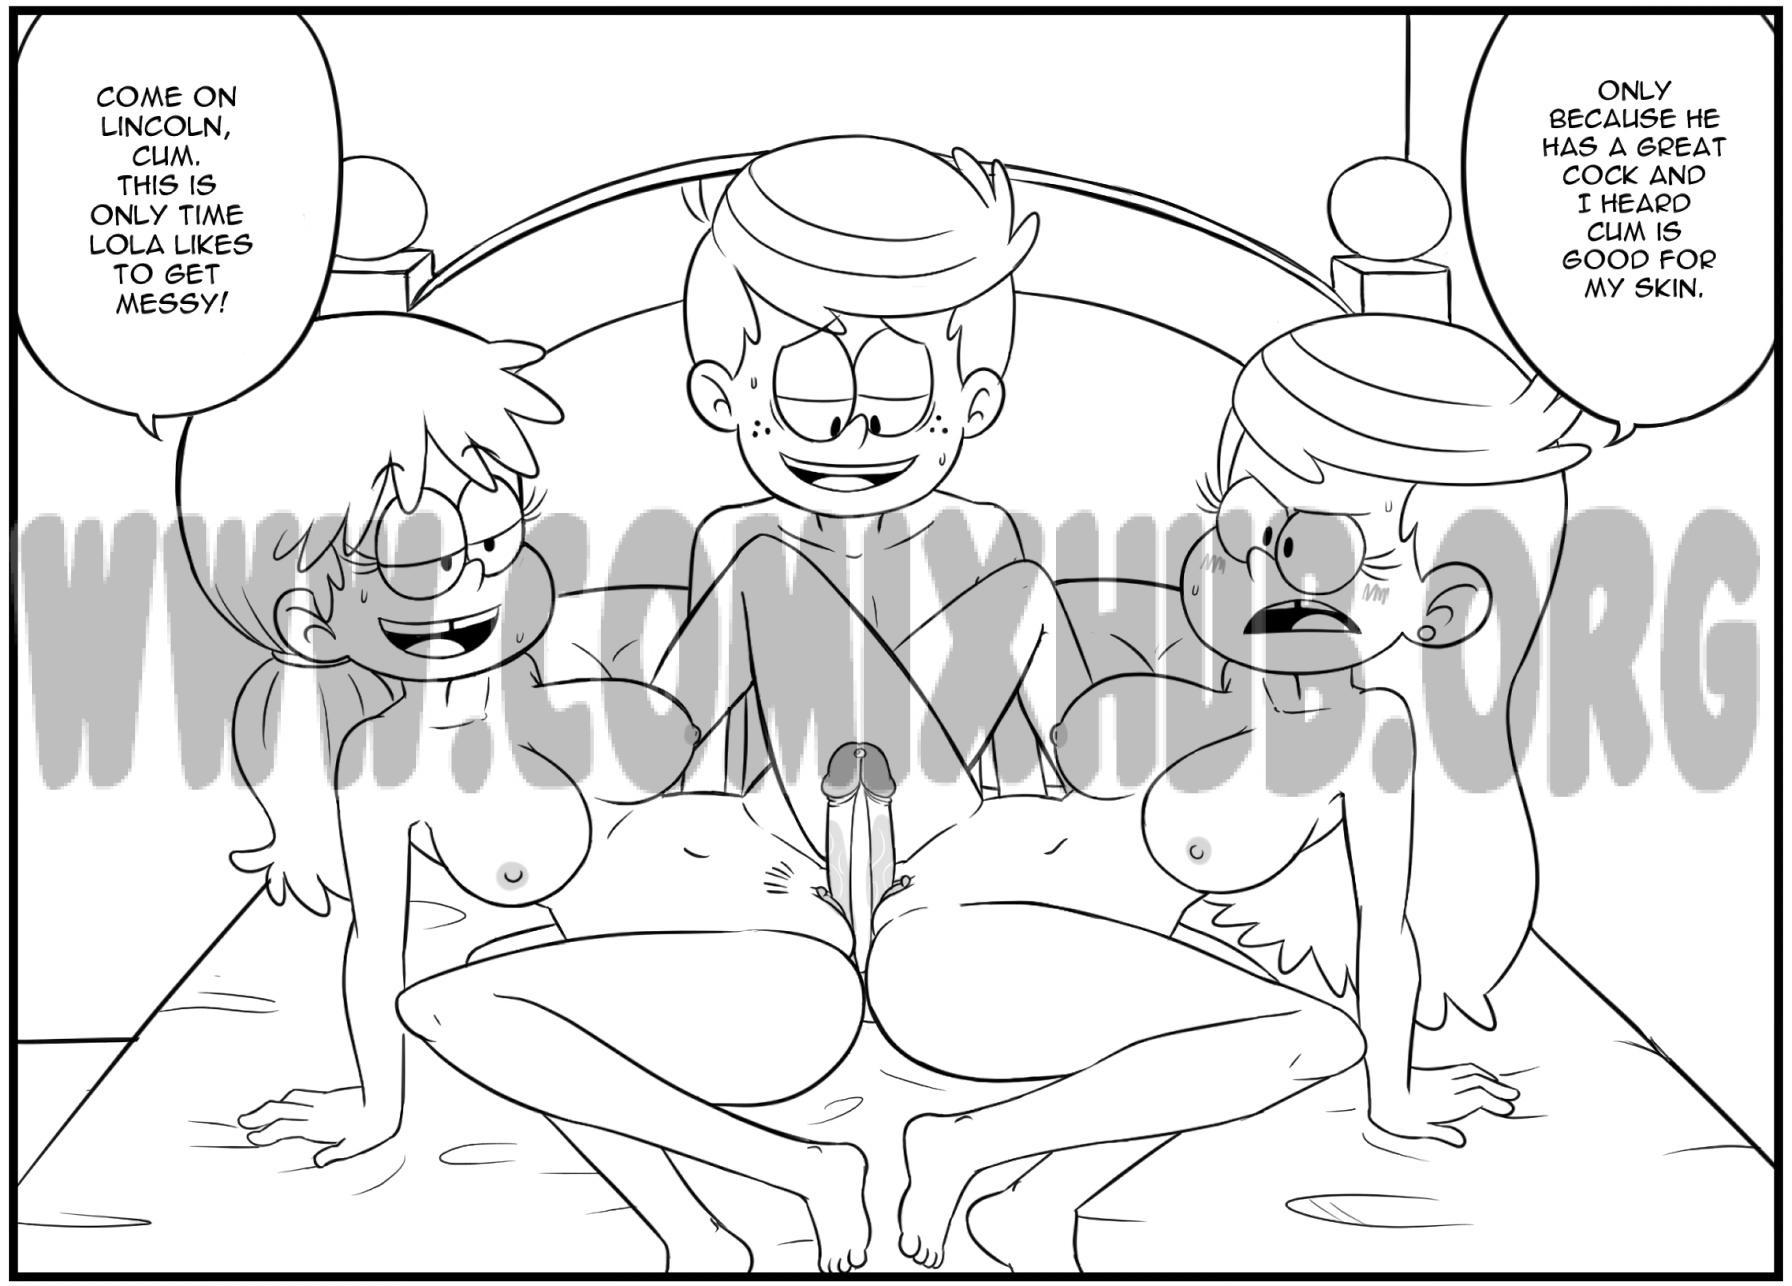 Family Bonding porn comics Oral sex, Big Tits, Blowjob, Cum Shots, cunnilingus, Group Sex, incest, Lolicon, Masturbation, MILF, Straight, Threesome, Titfuck